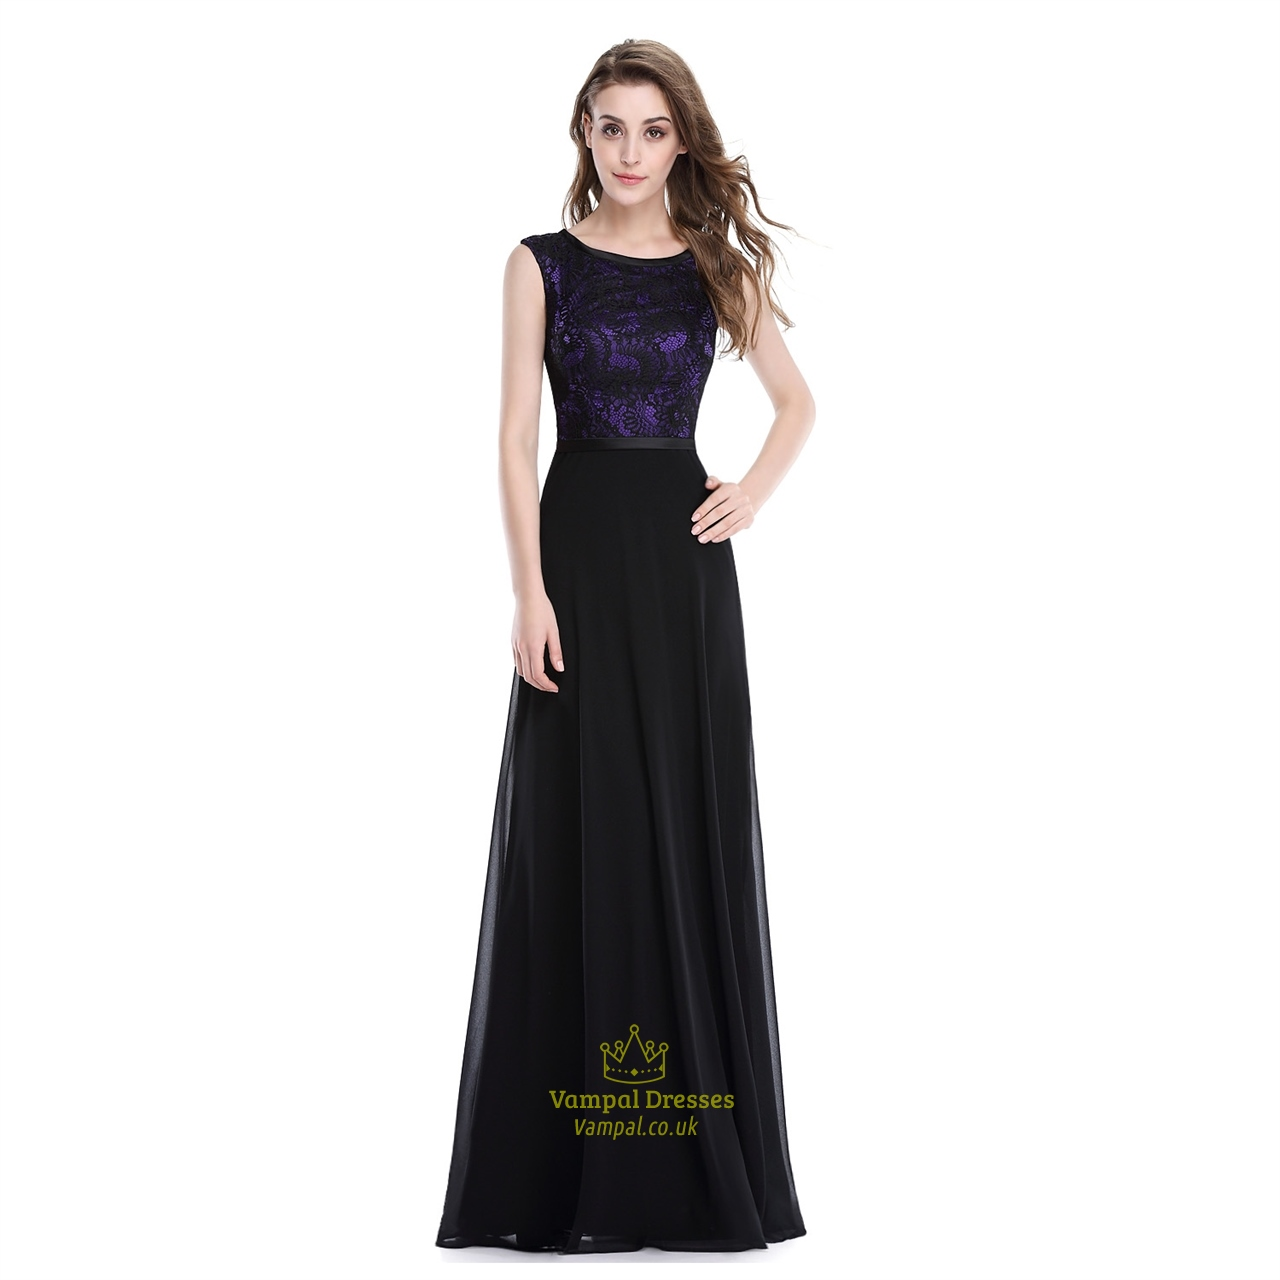 Elegant Long Purple And Black Chiffon Prom Dress With Lace . 7428047f8